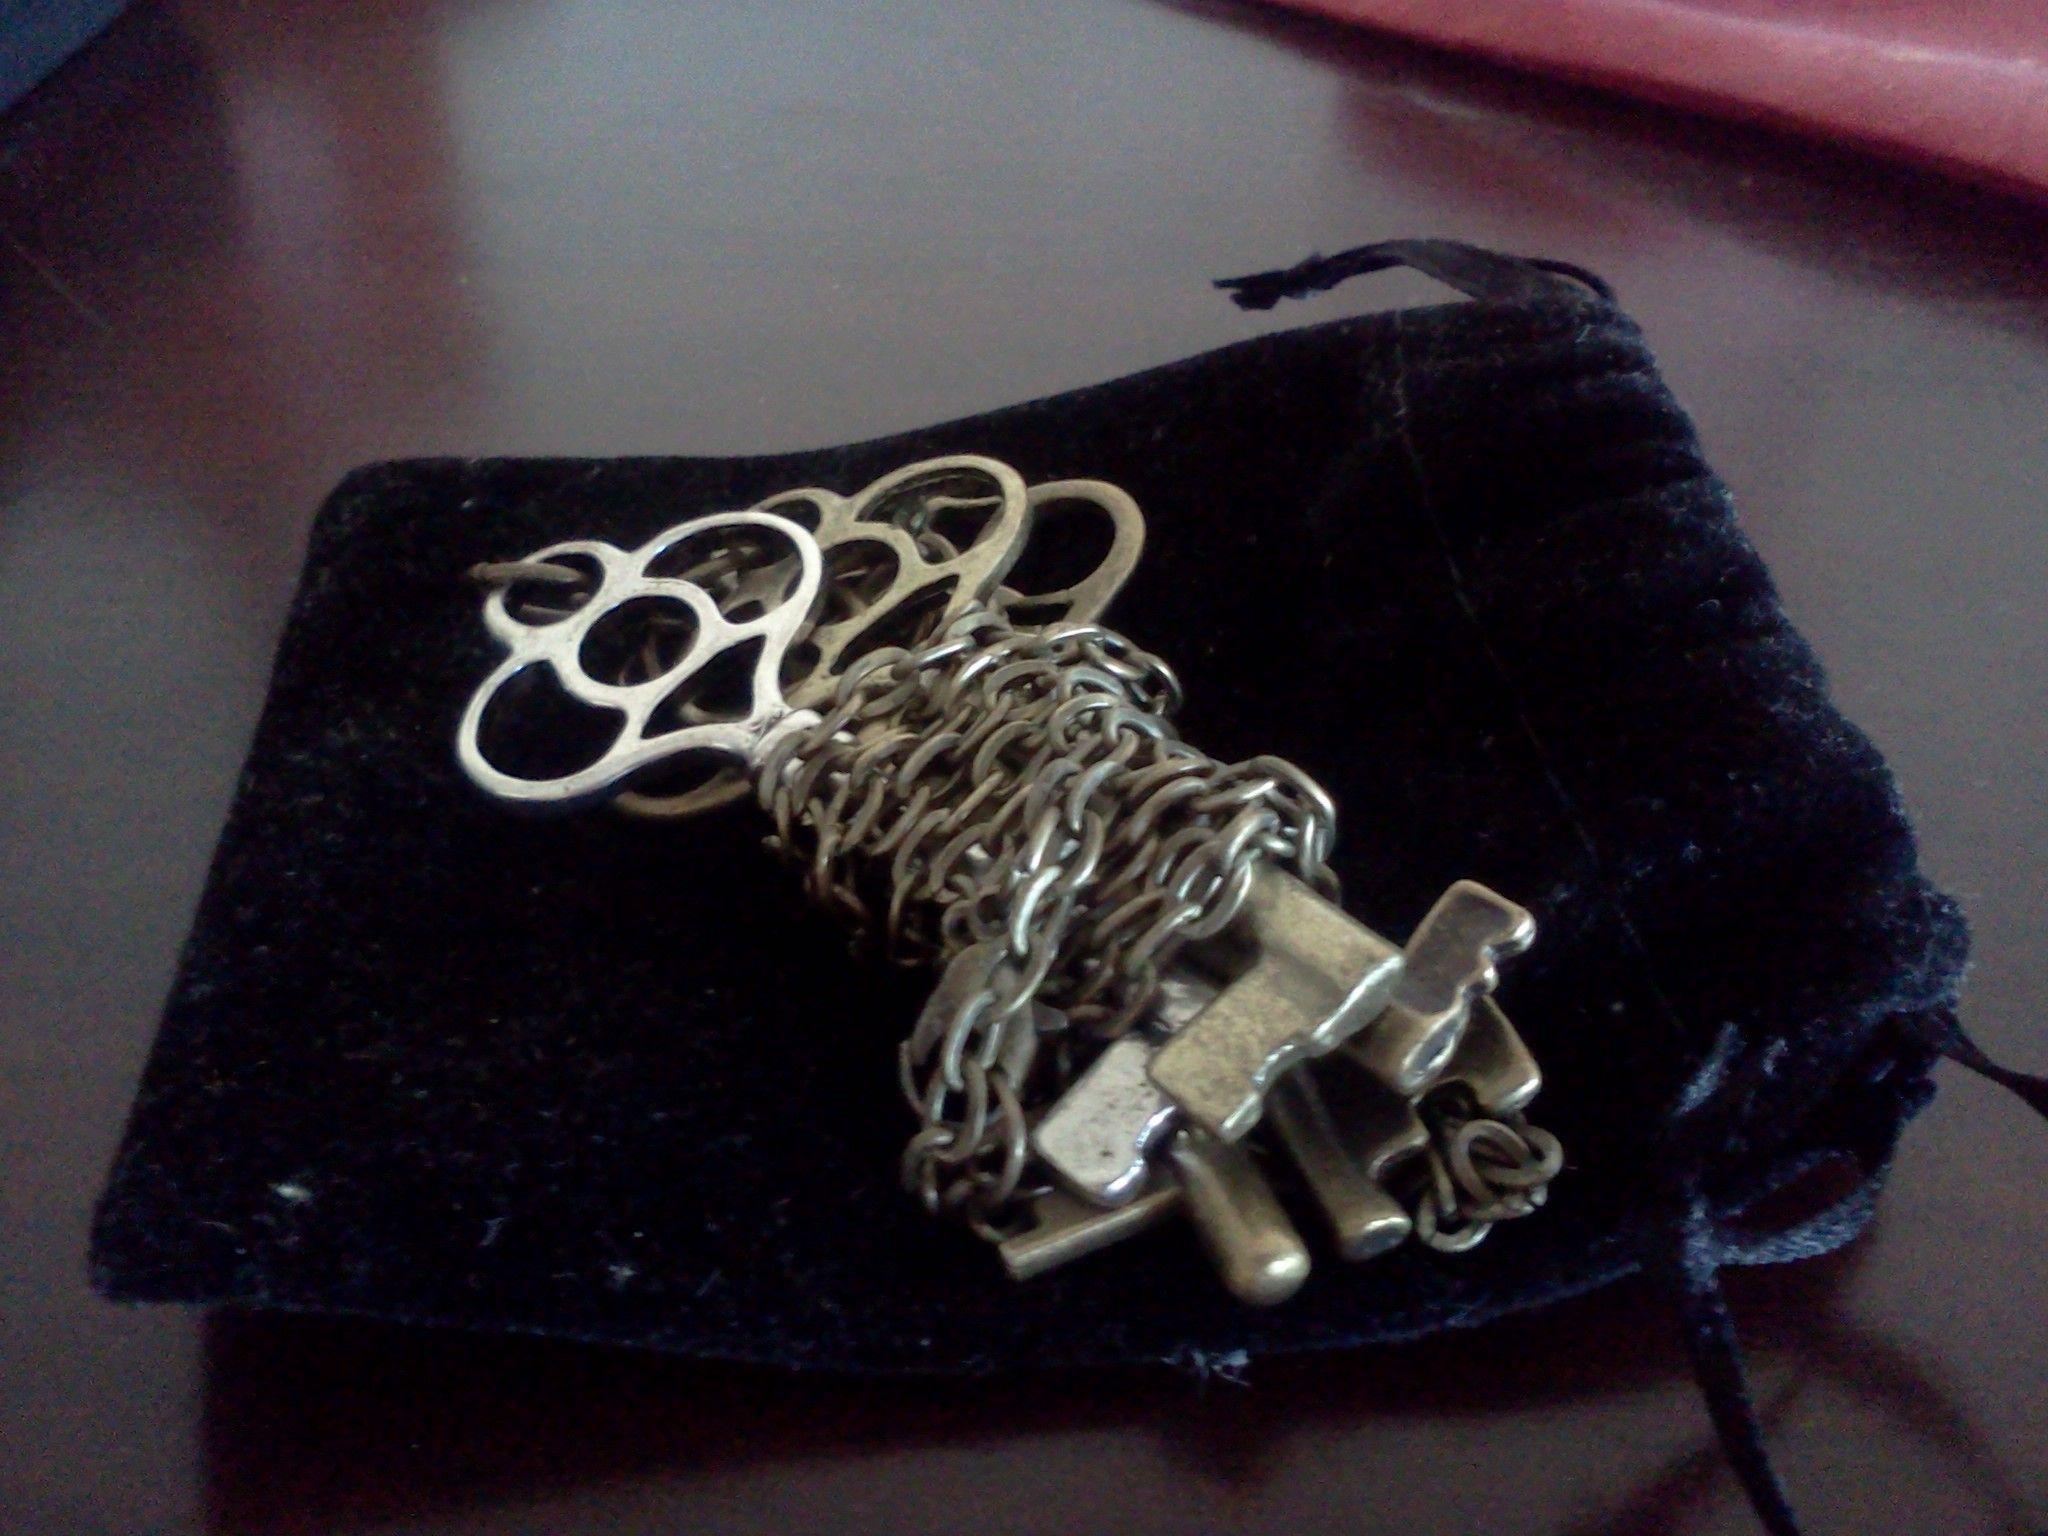 Handfasting keys, heathenry, asatru, forn sed, fyrnsidu